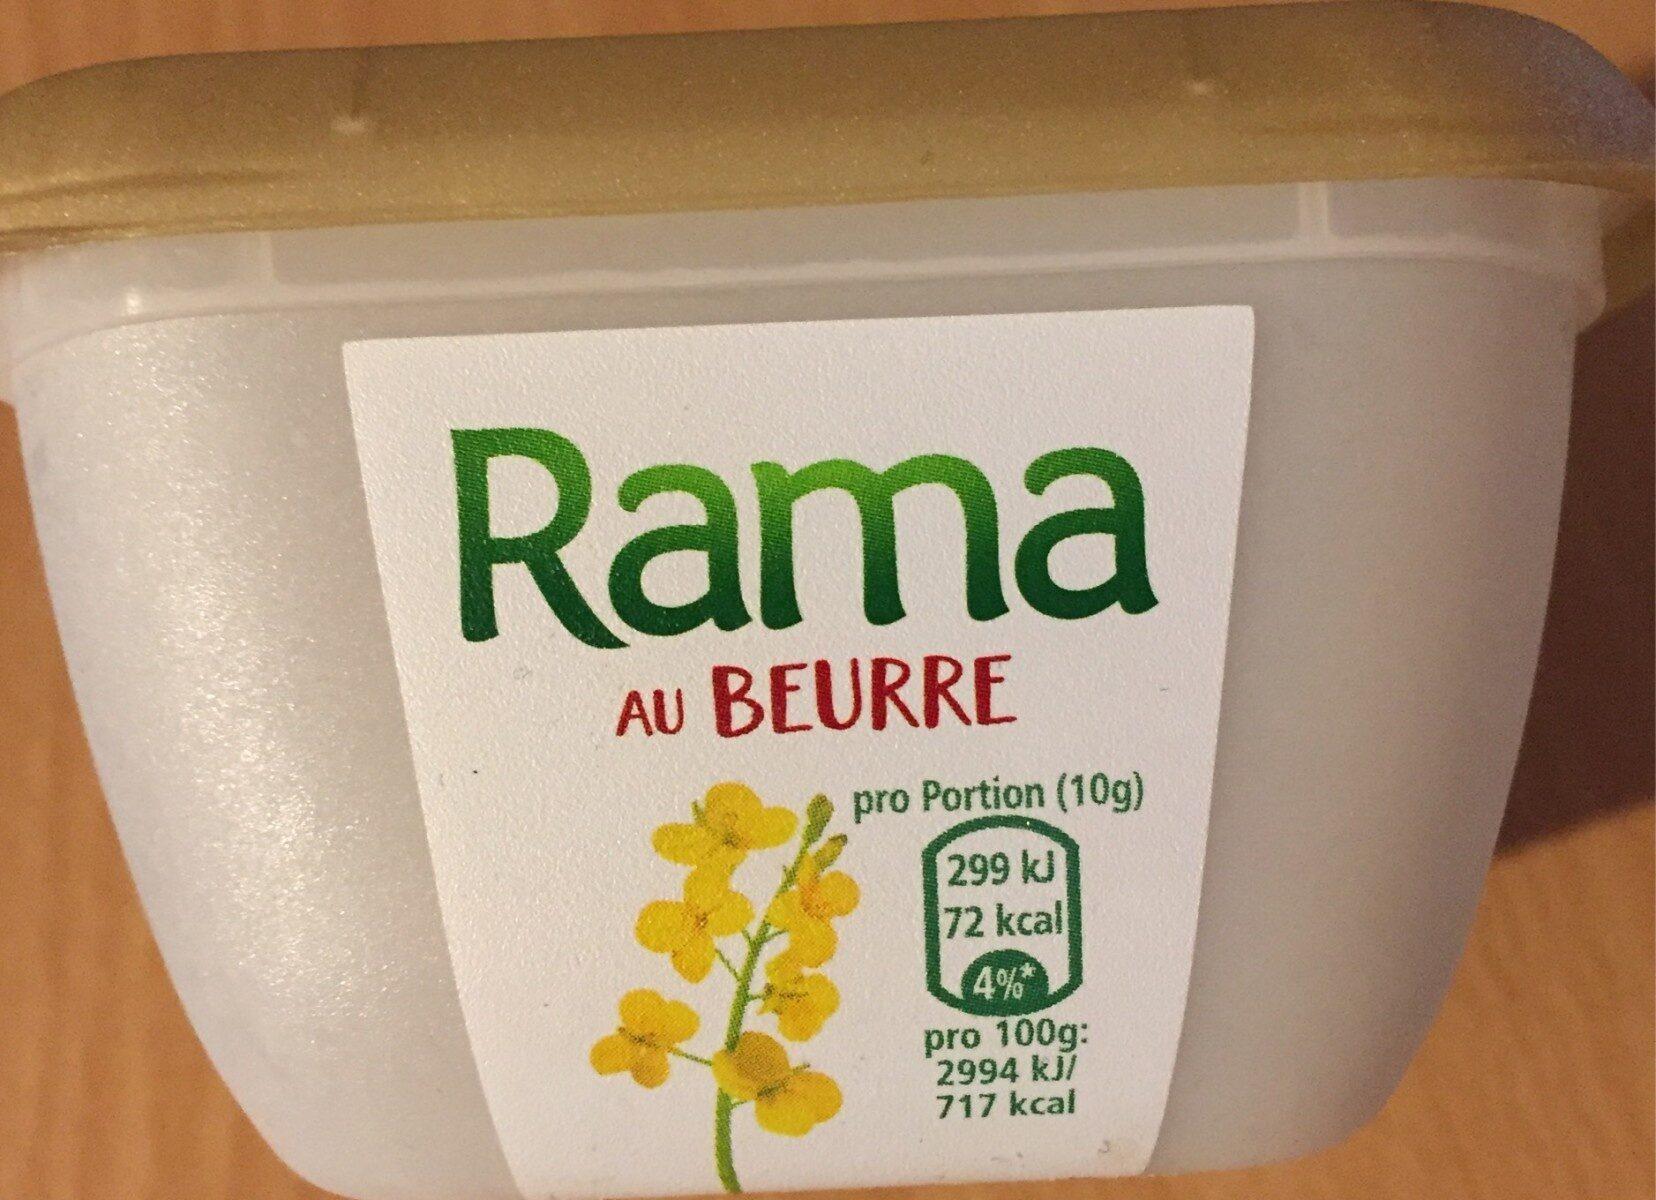 Rama au beurre - Produkt - fr